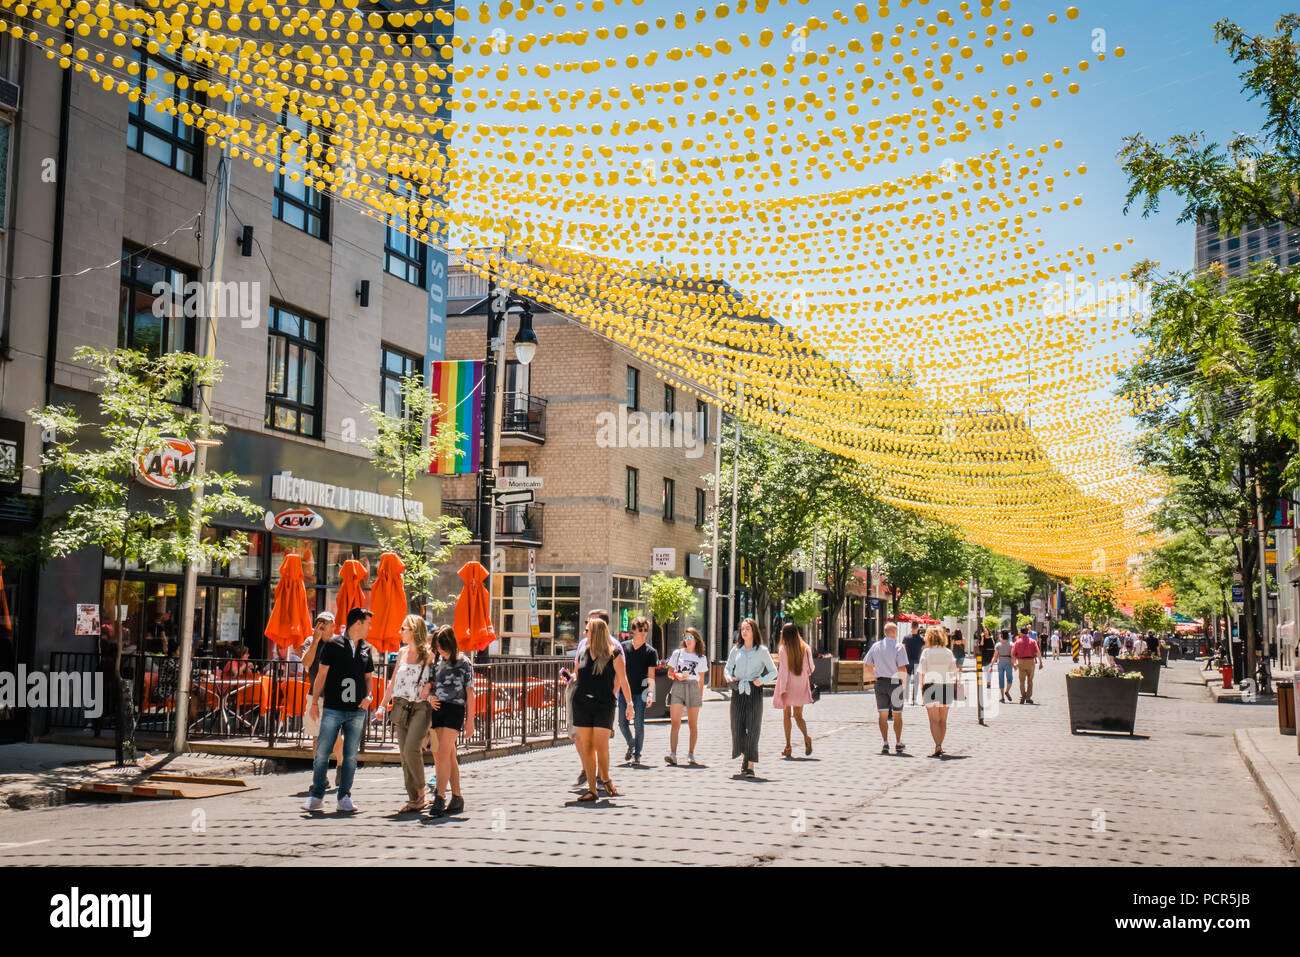 Montreal Gay Village - Stock Image